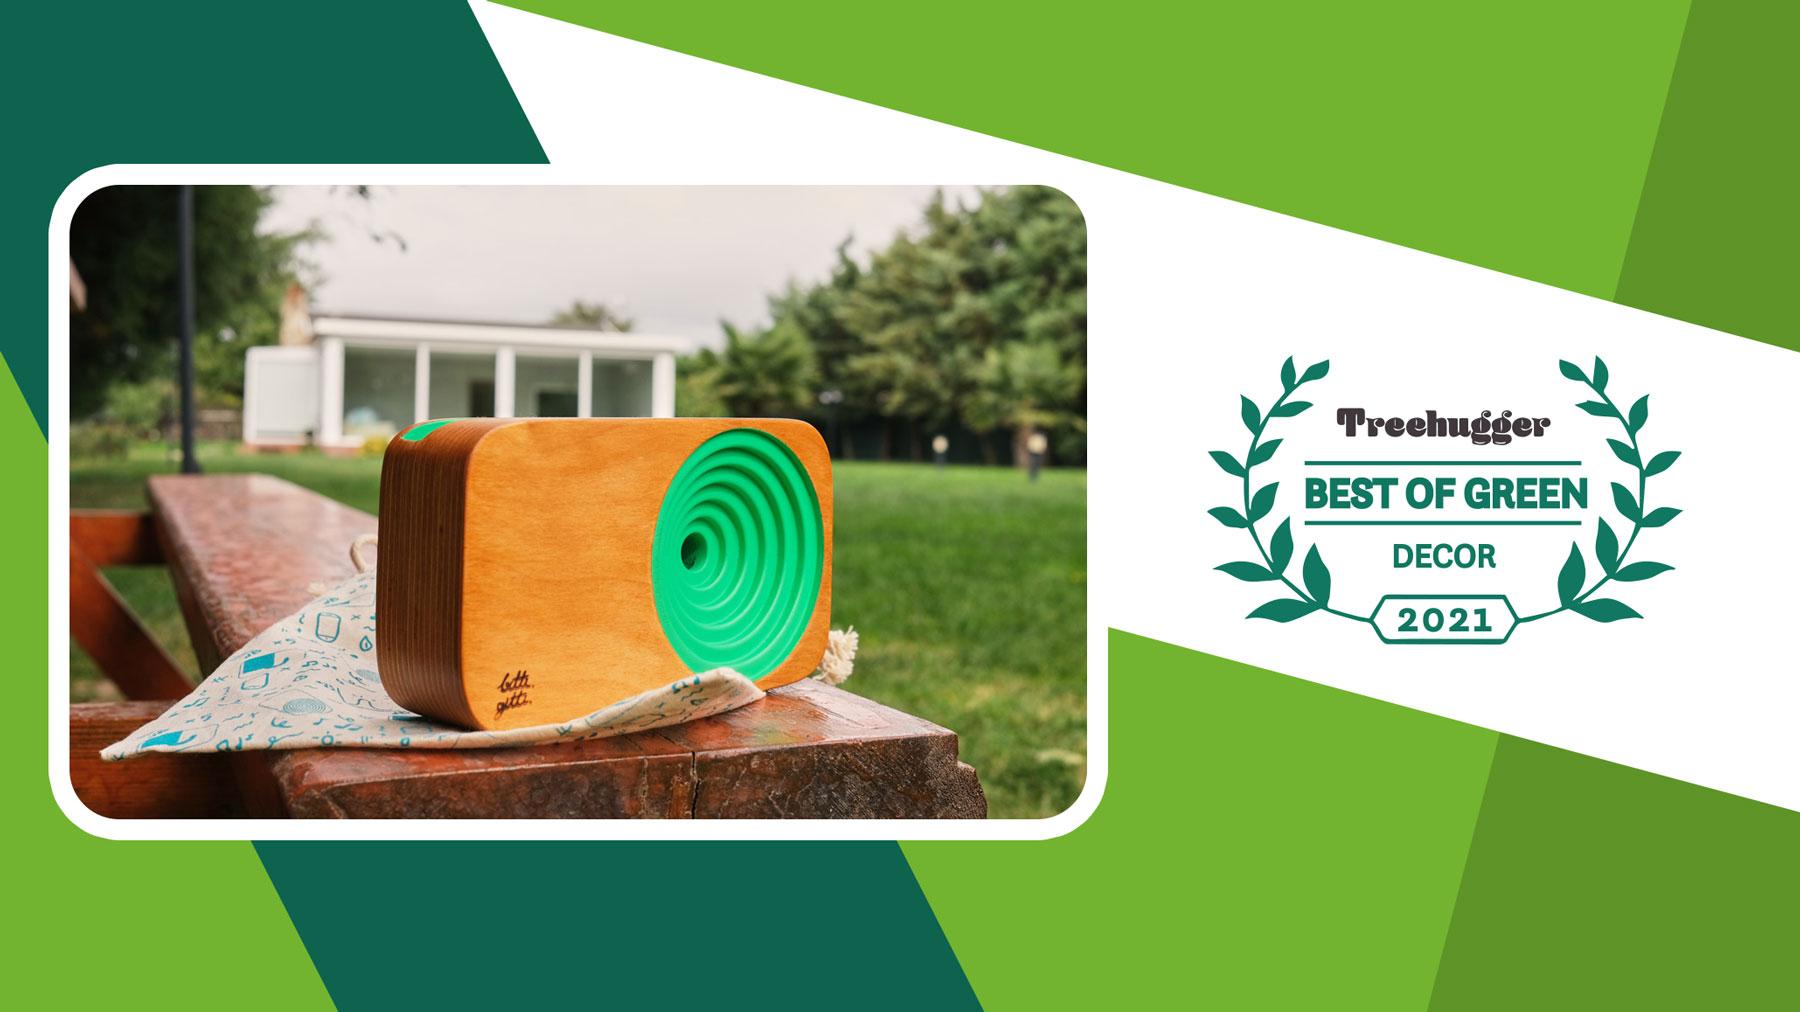 treehugger eco design award the wooden sound system